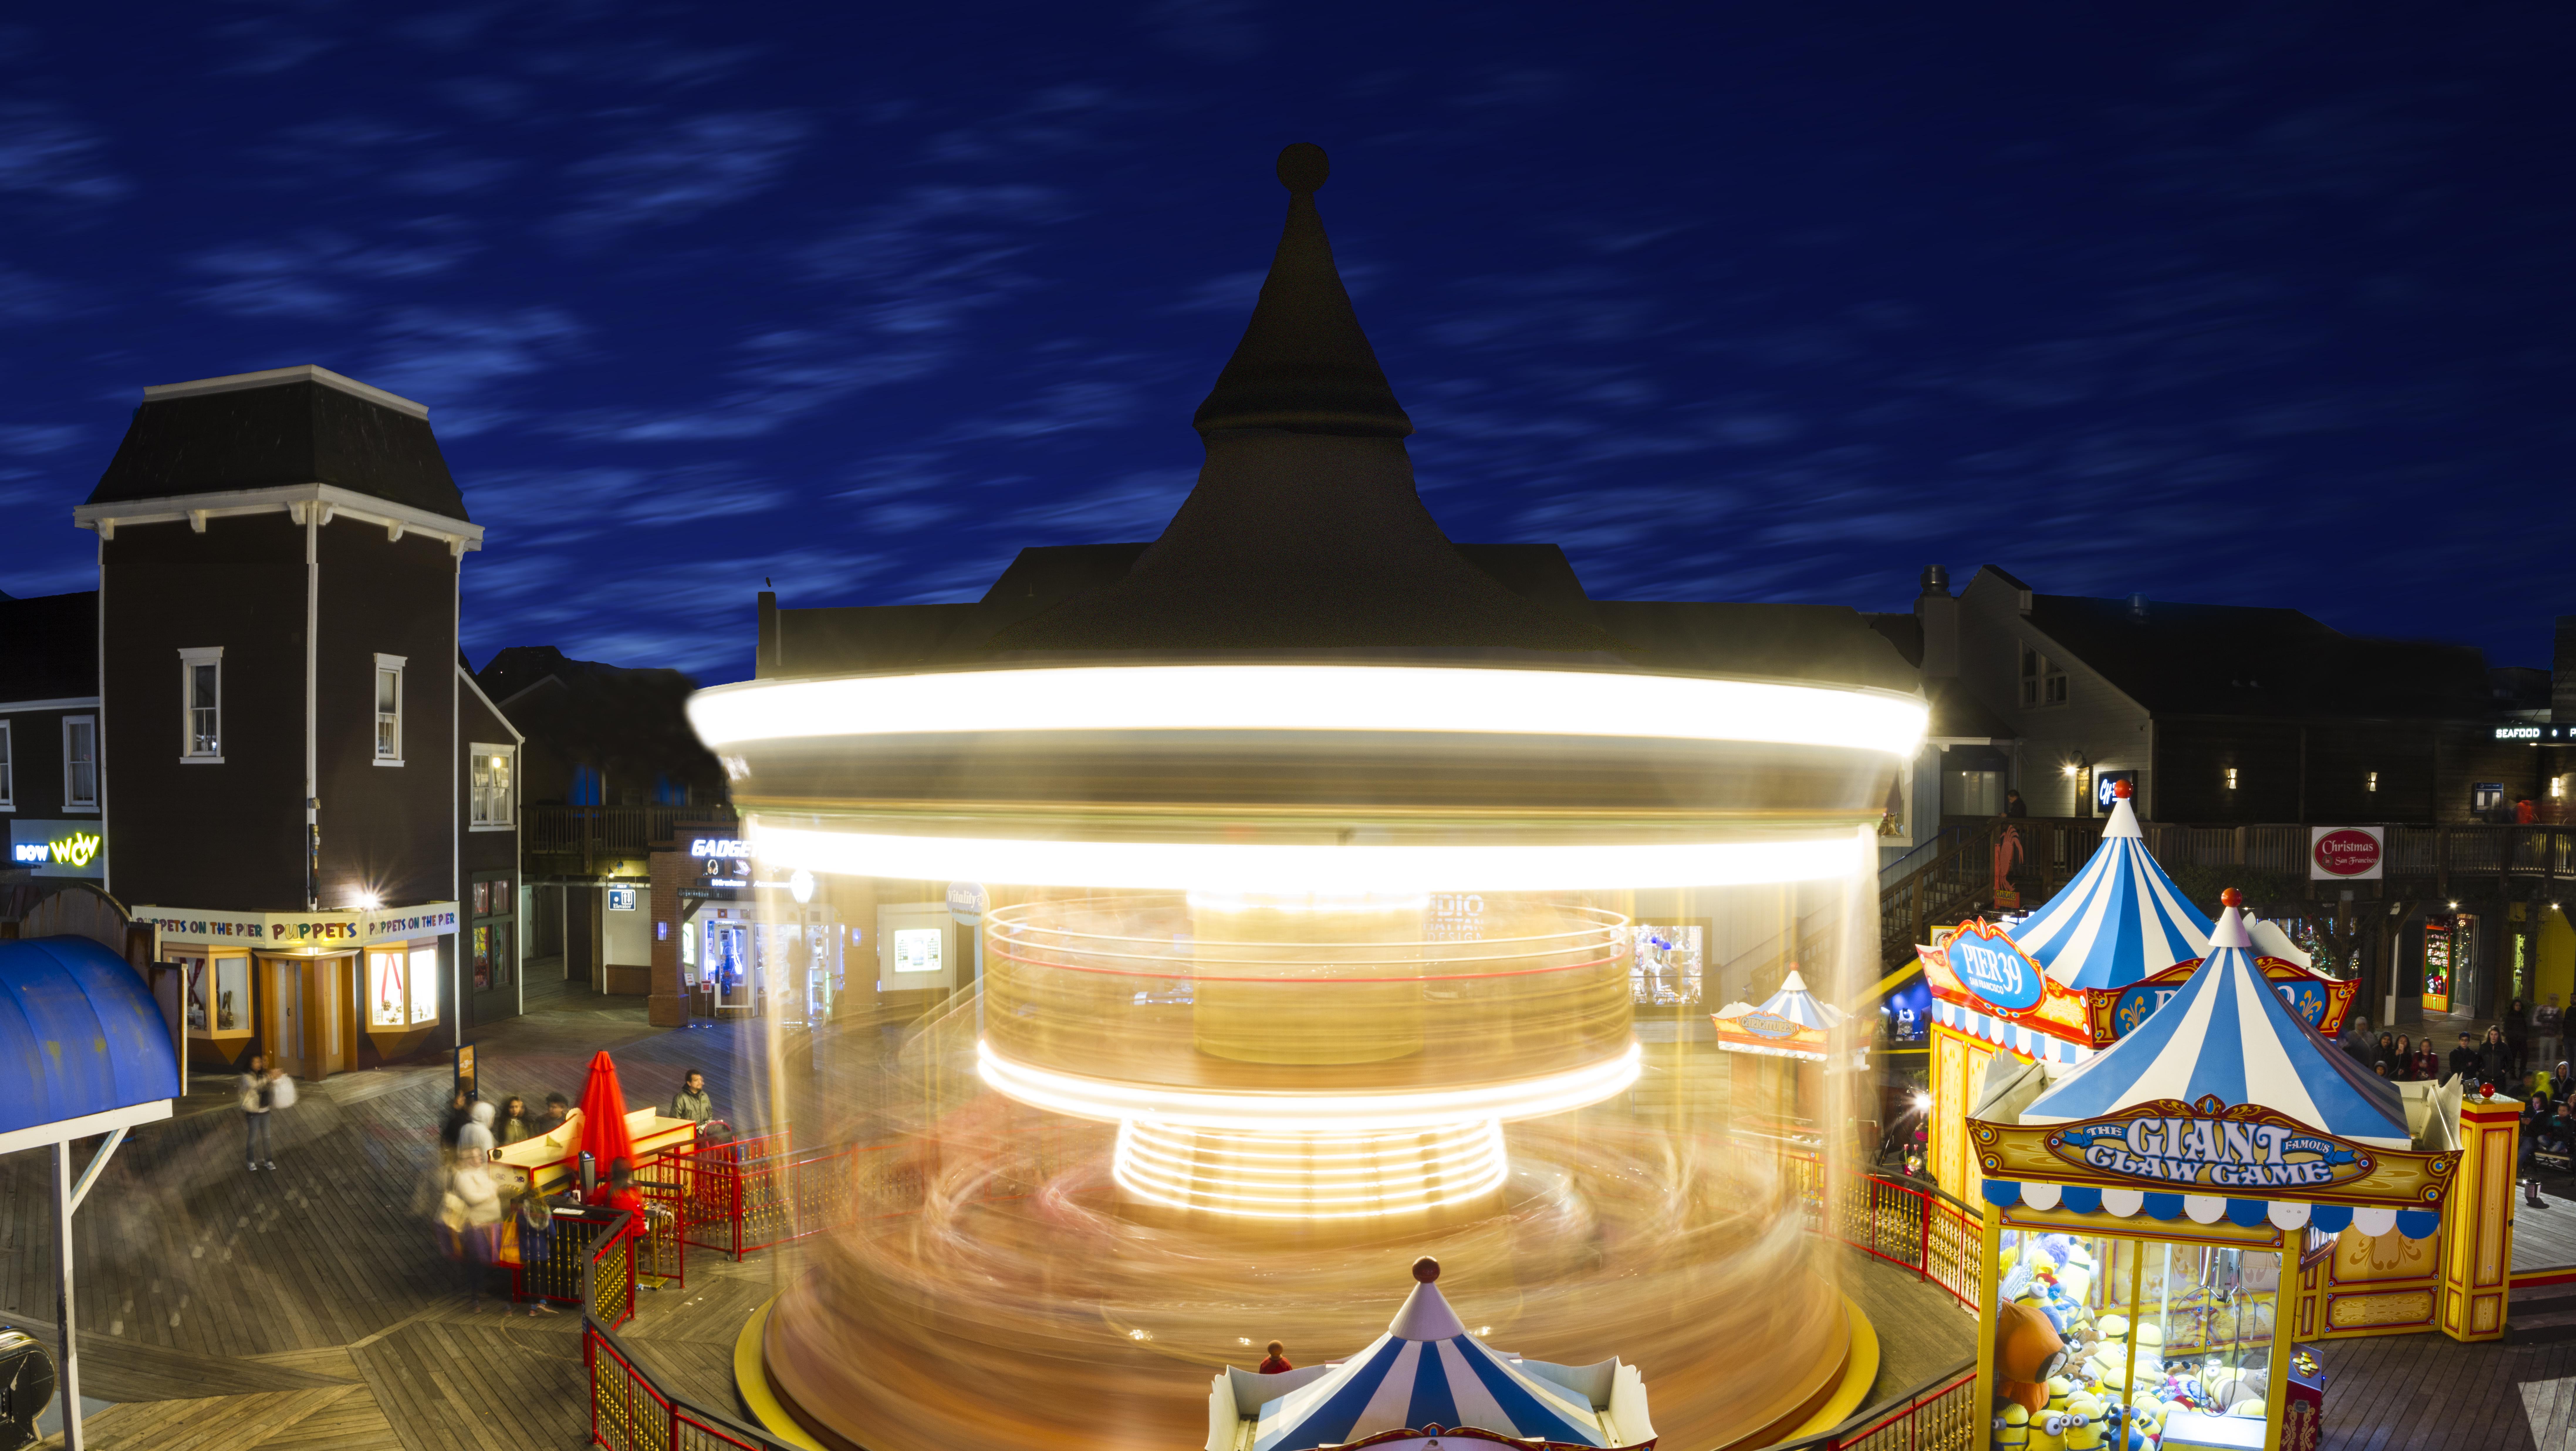 Pier 30 Carousel